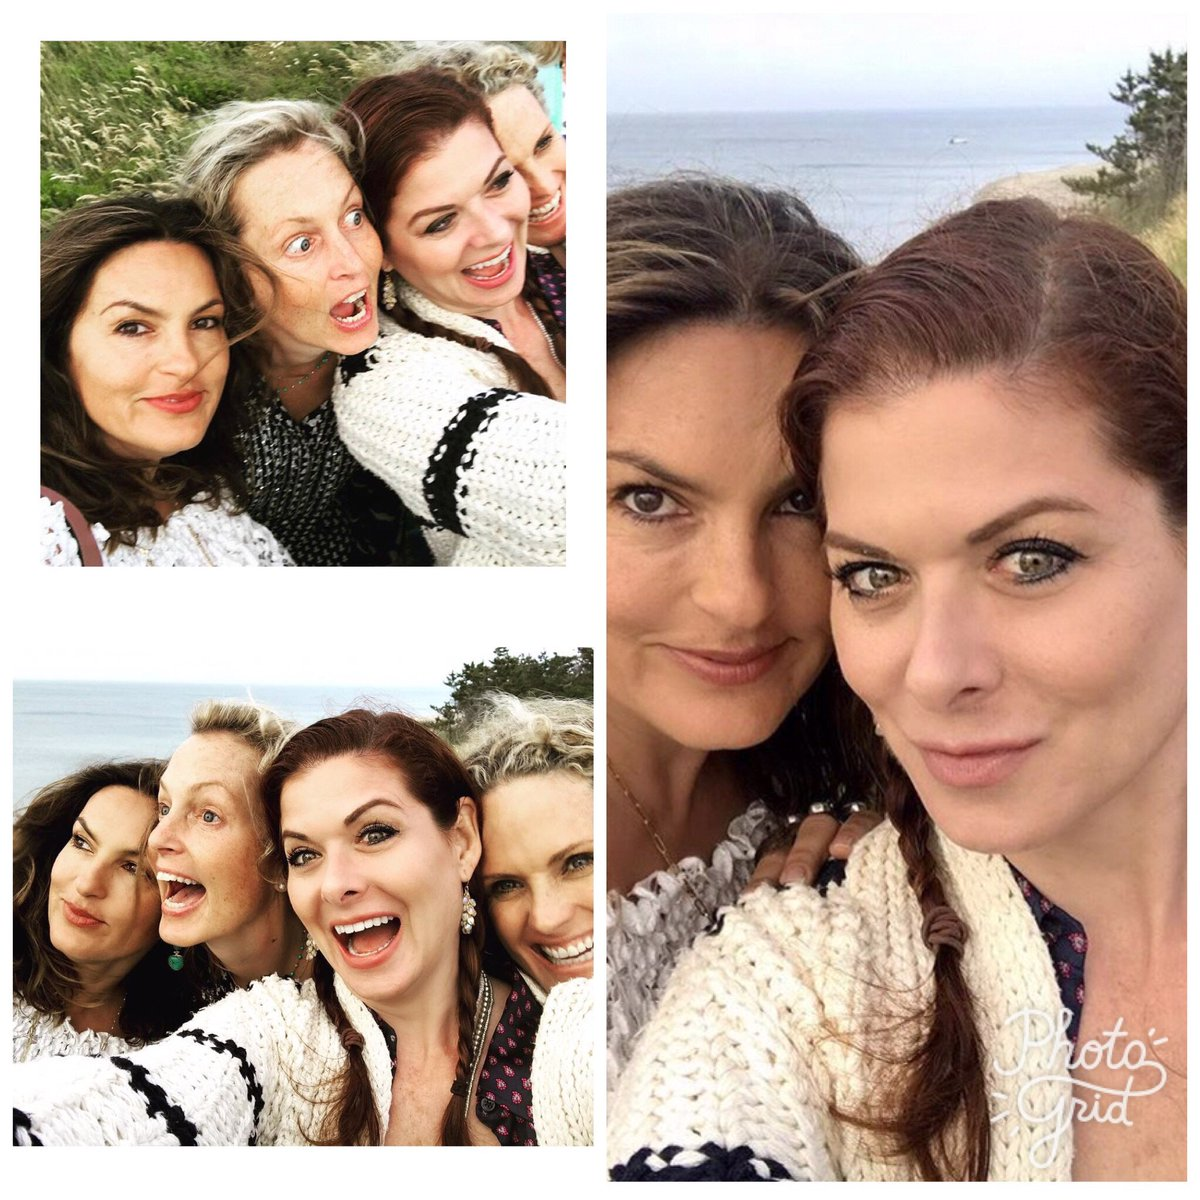 #sundayselfie @Mariska @AliEWentworth @AshleybrittMcD @DebraMessing #beautifulinsideandout Happy Sunday<br>http://pic.twitter.com/qCm6S6xFEt